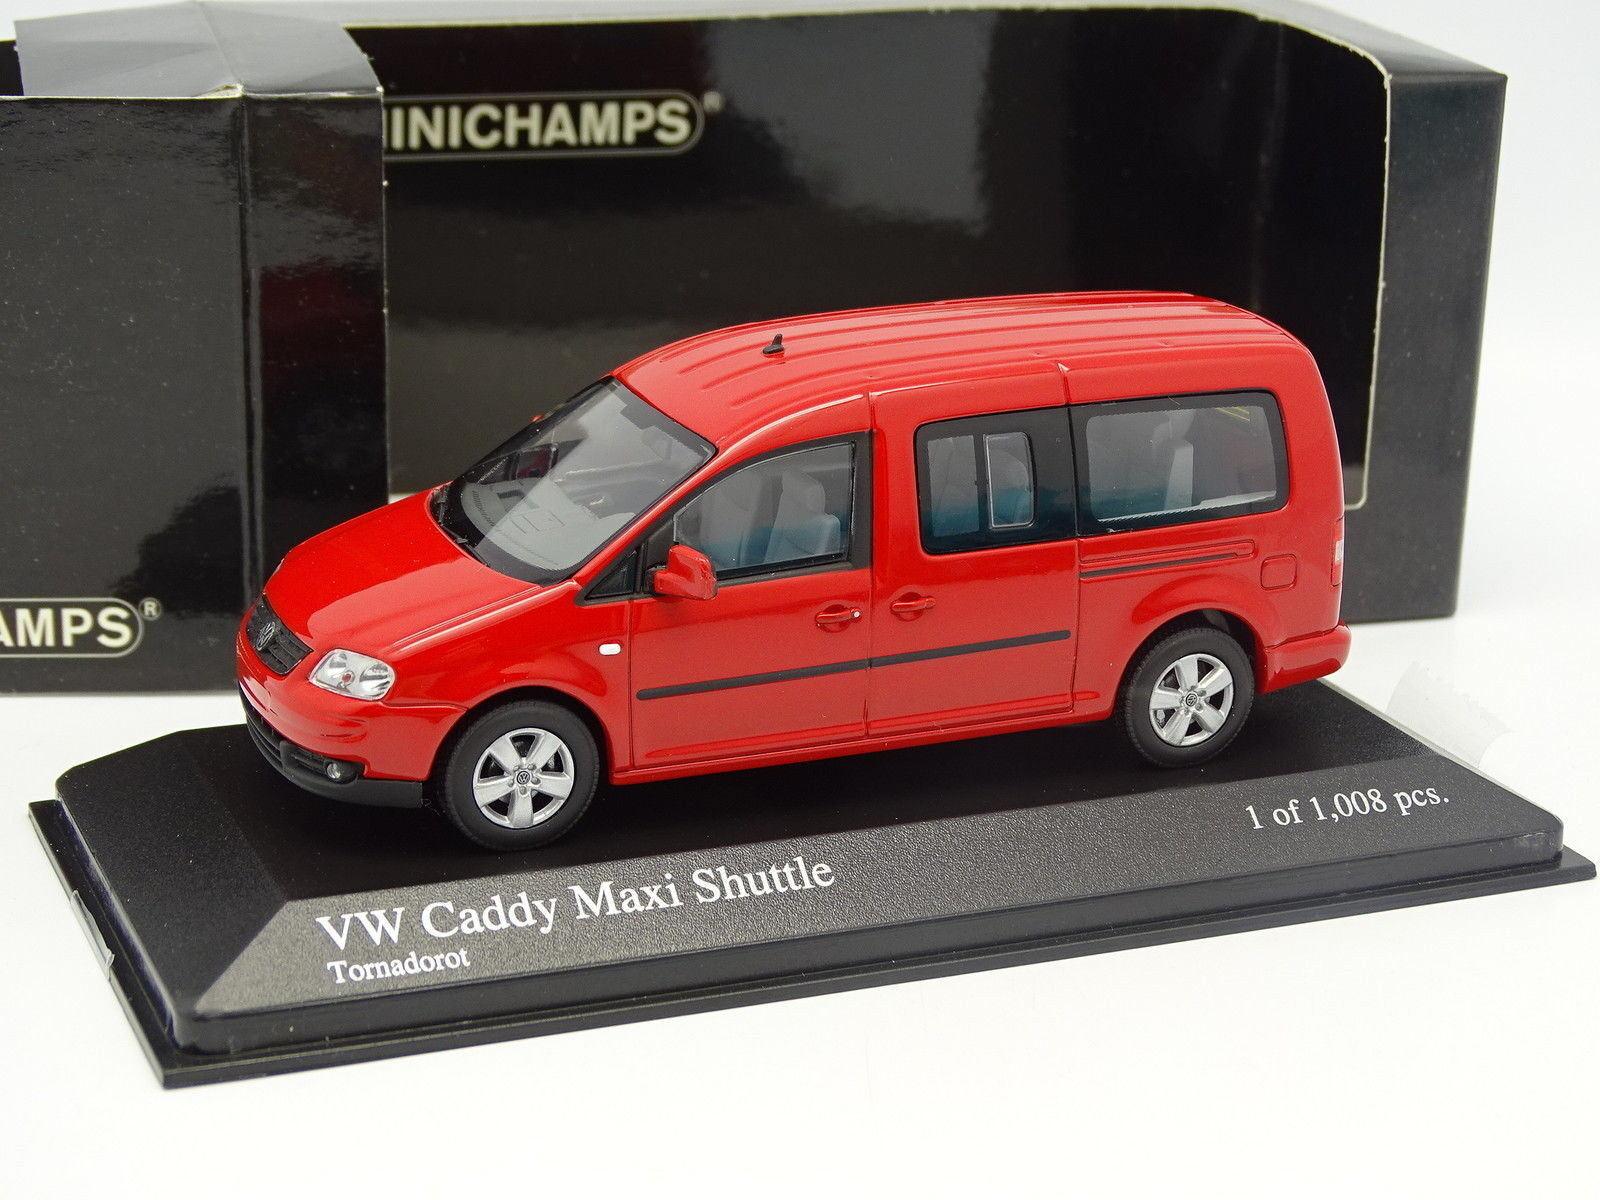 Minichamps 1 43 - vw caddy maxi Shuttle Red